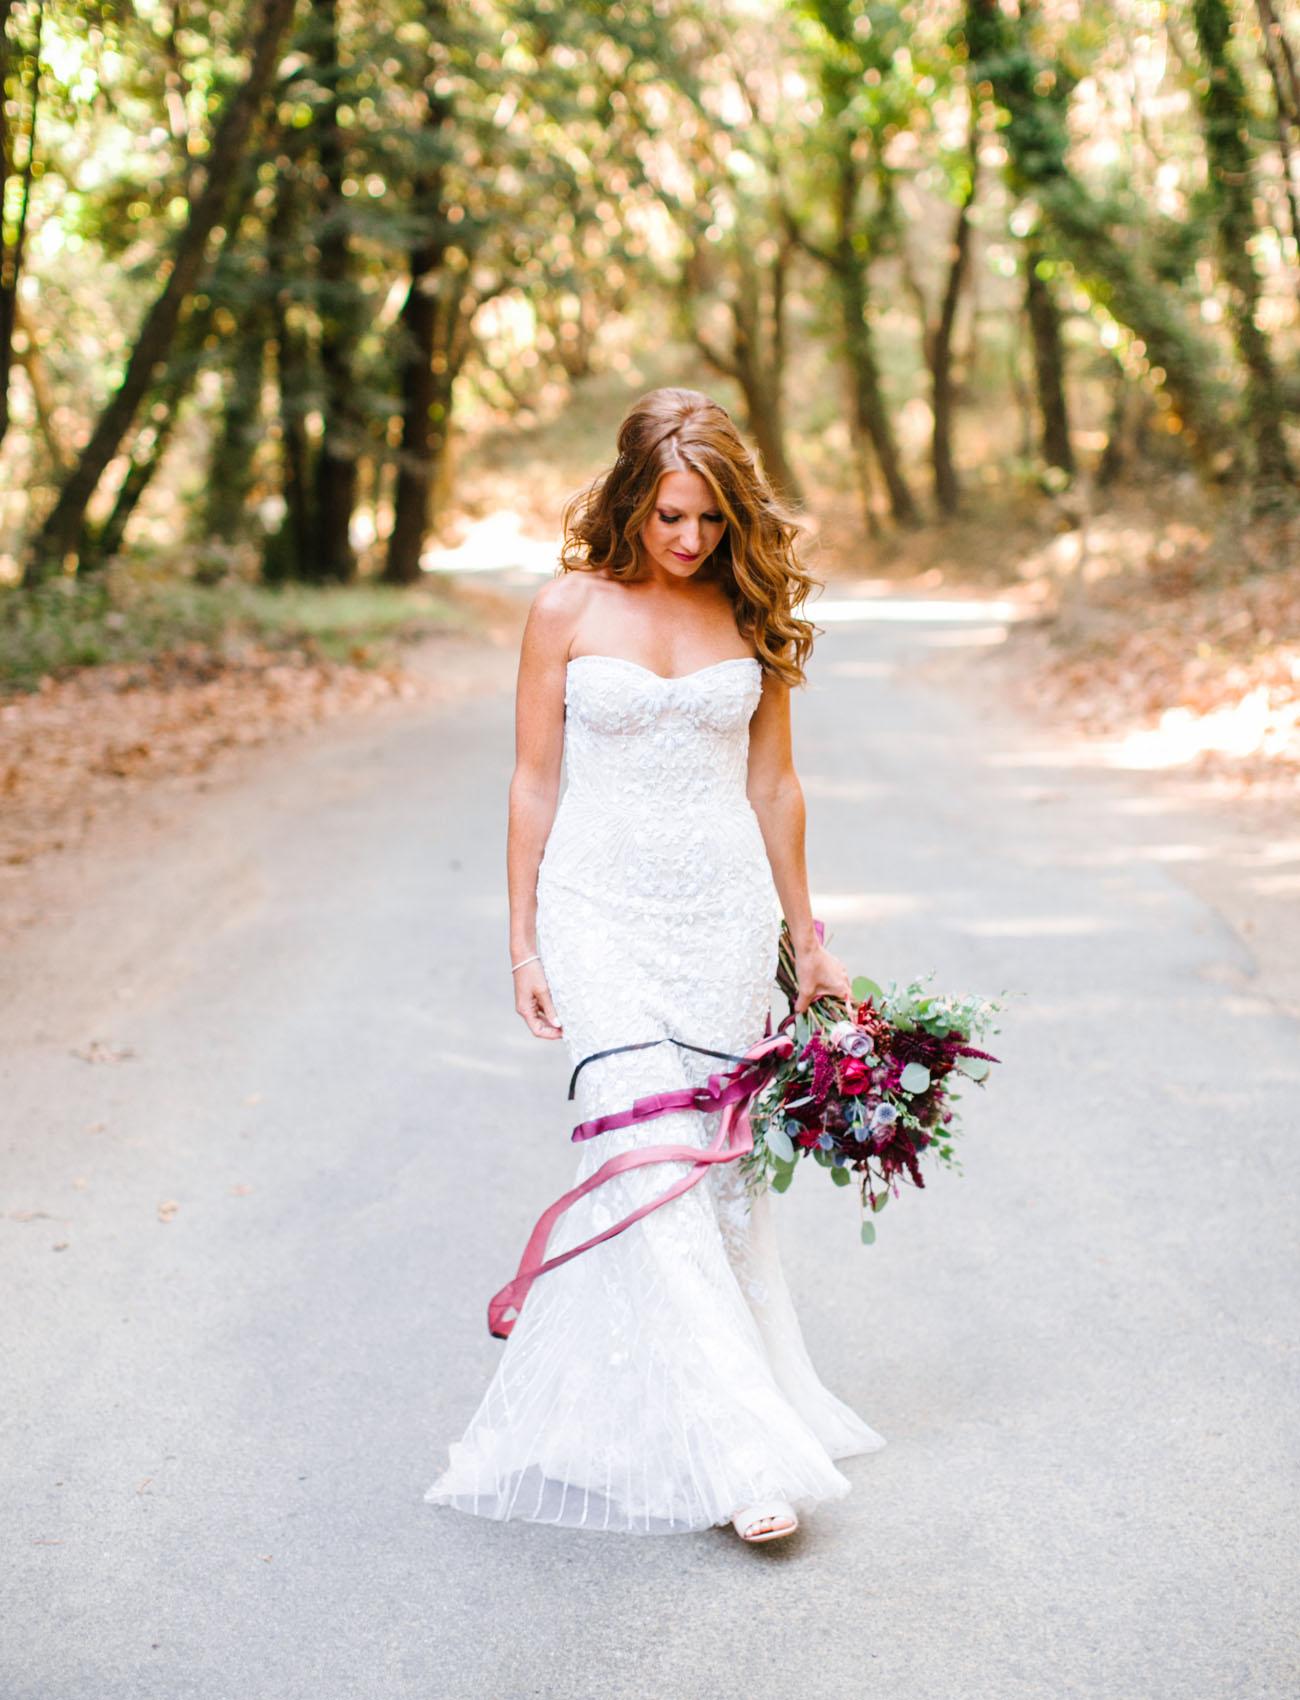 Wedding Dress Boutiques In Chicago 81 Superb Monique Lhuillier Wedding Dress